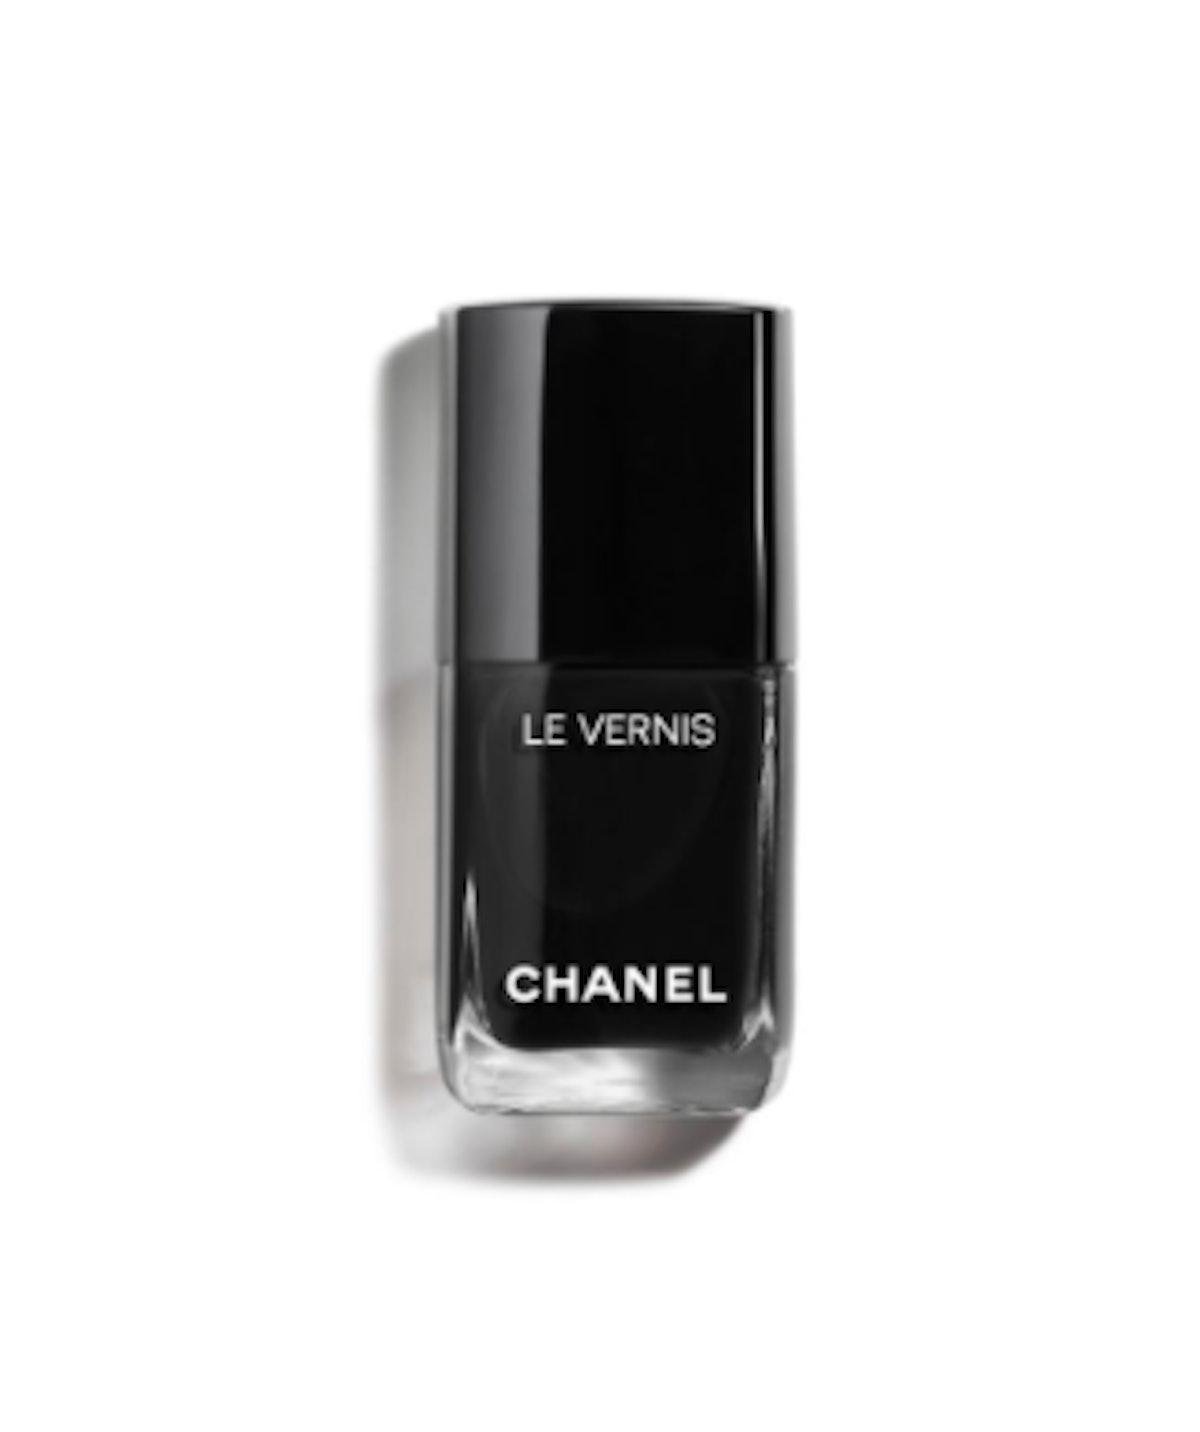 Le Vernis Longwear Nail Color in Pure Black